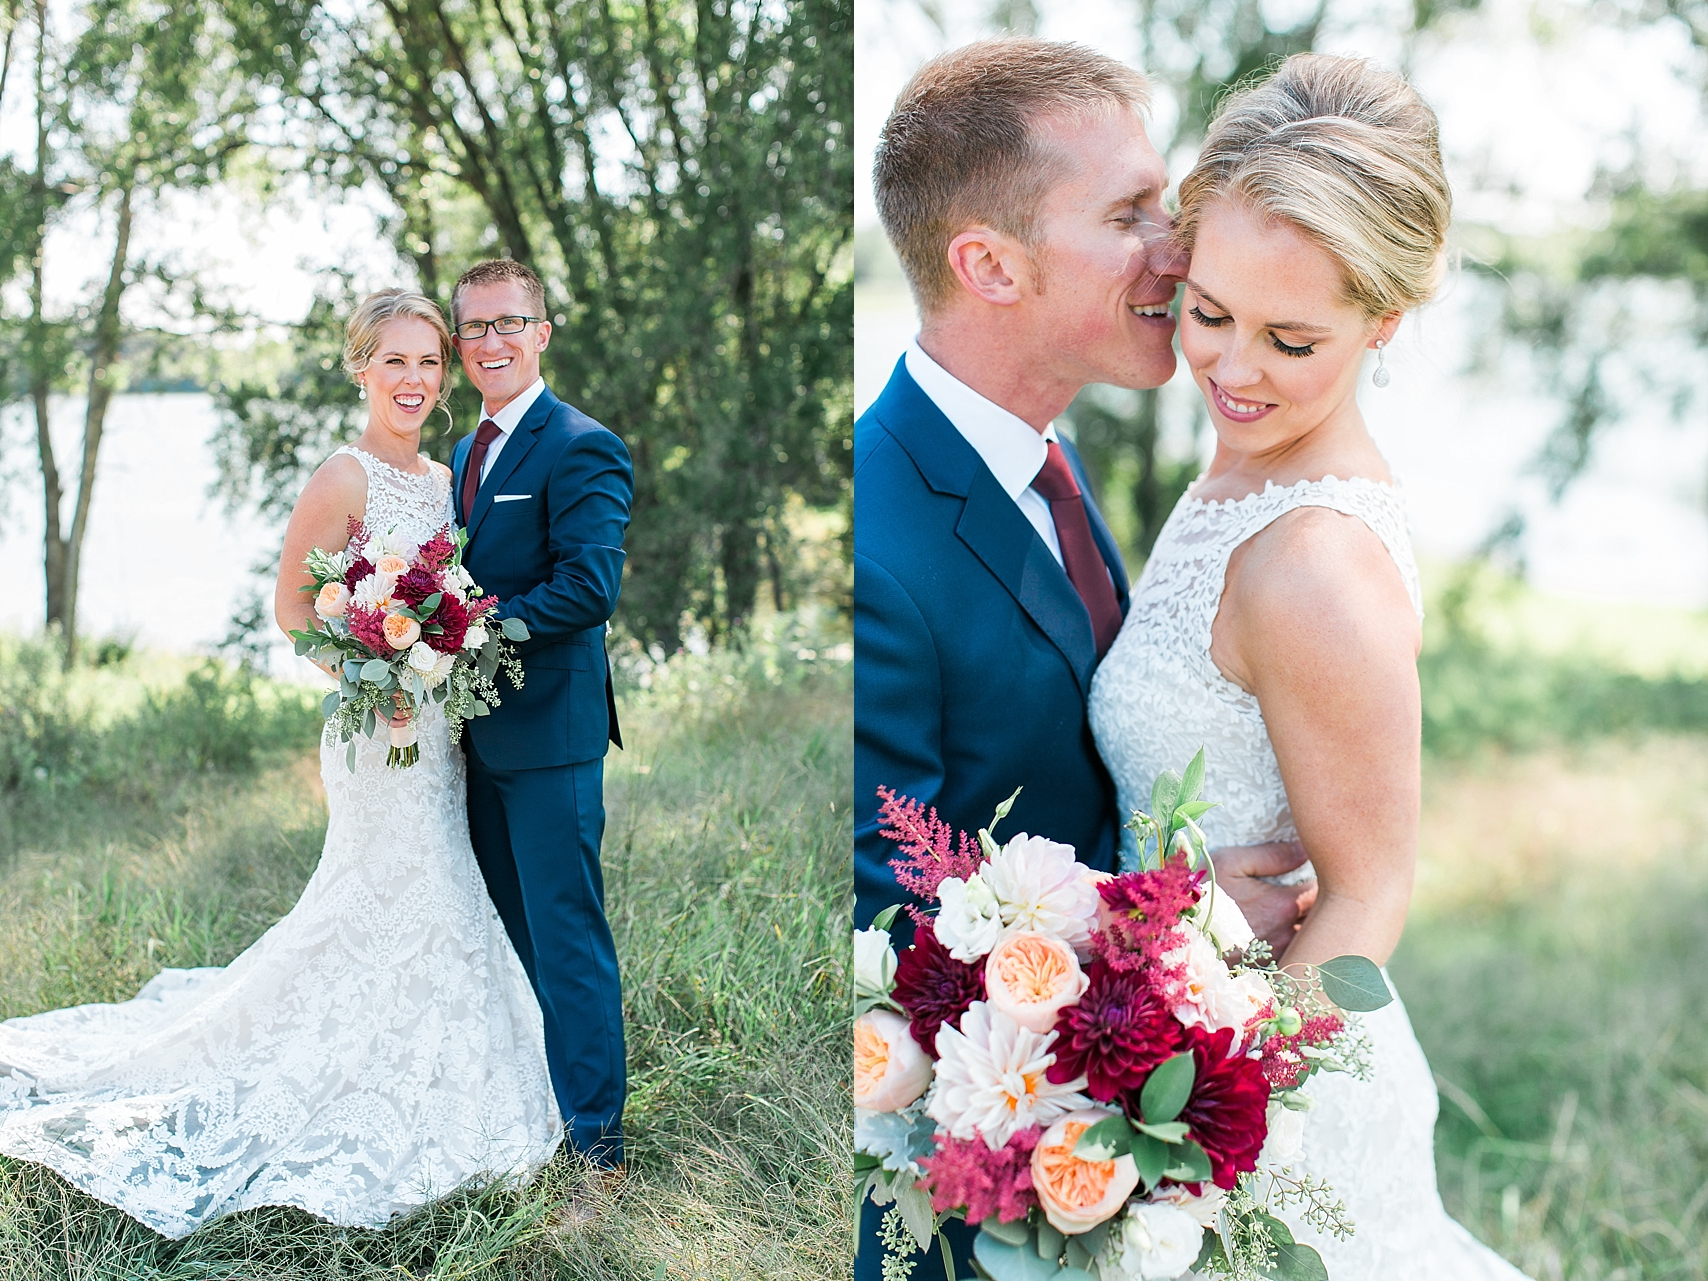 Minnesota Minneapolis Wedding Photographer Best Of 2018 Weddings Mallory Kiesow Photography_0091.jpg